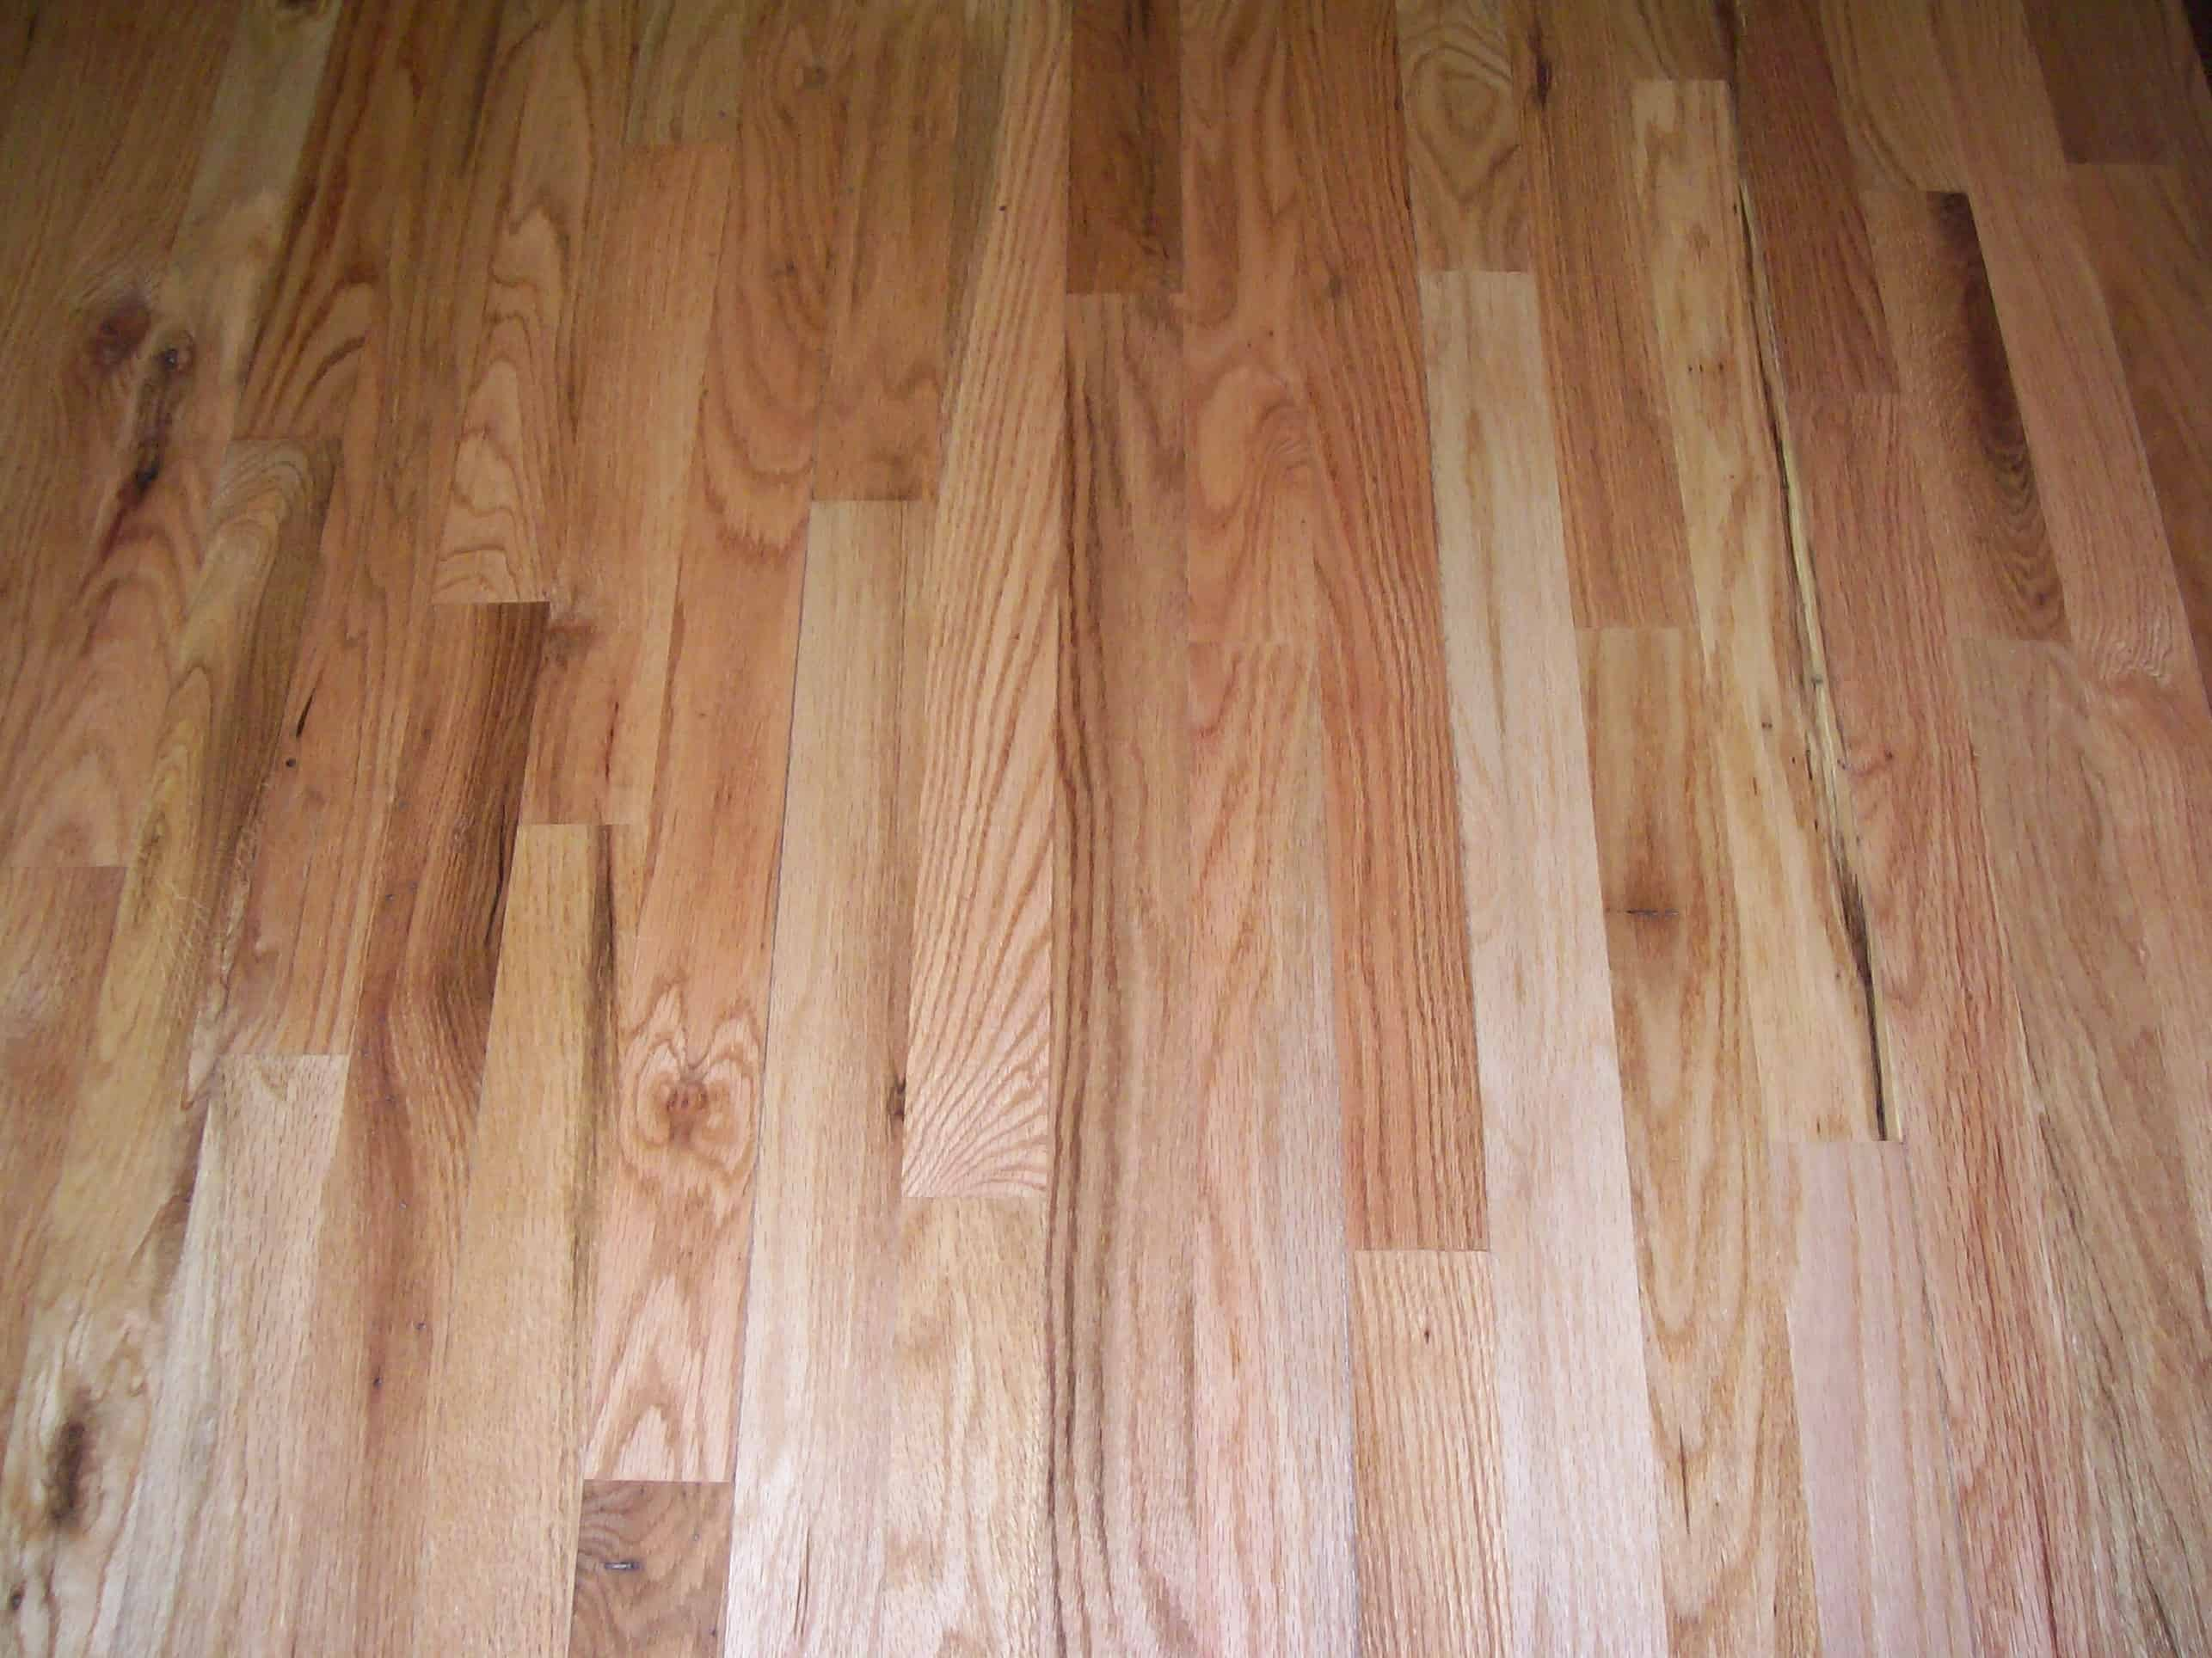 Red oak no 2 westchester the flooring girl Westchester wood flooring